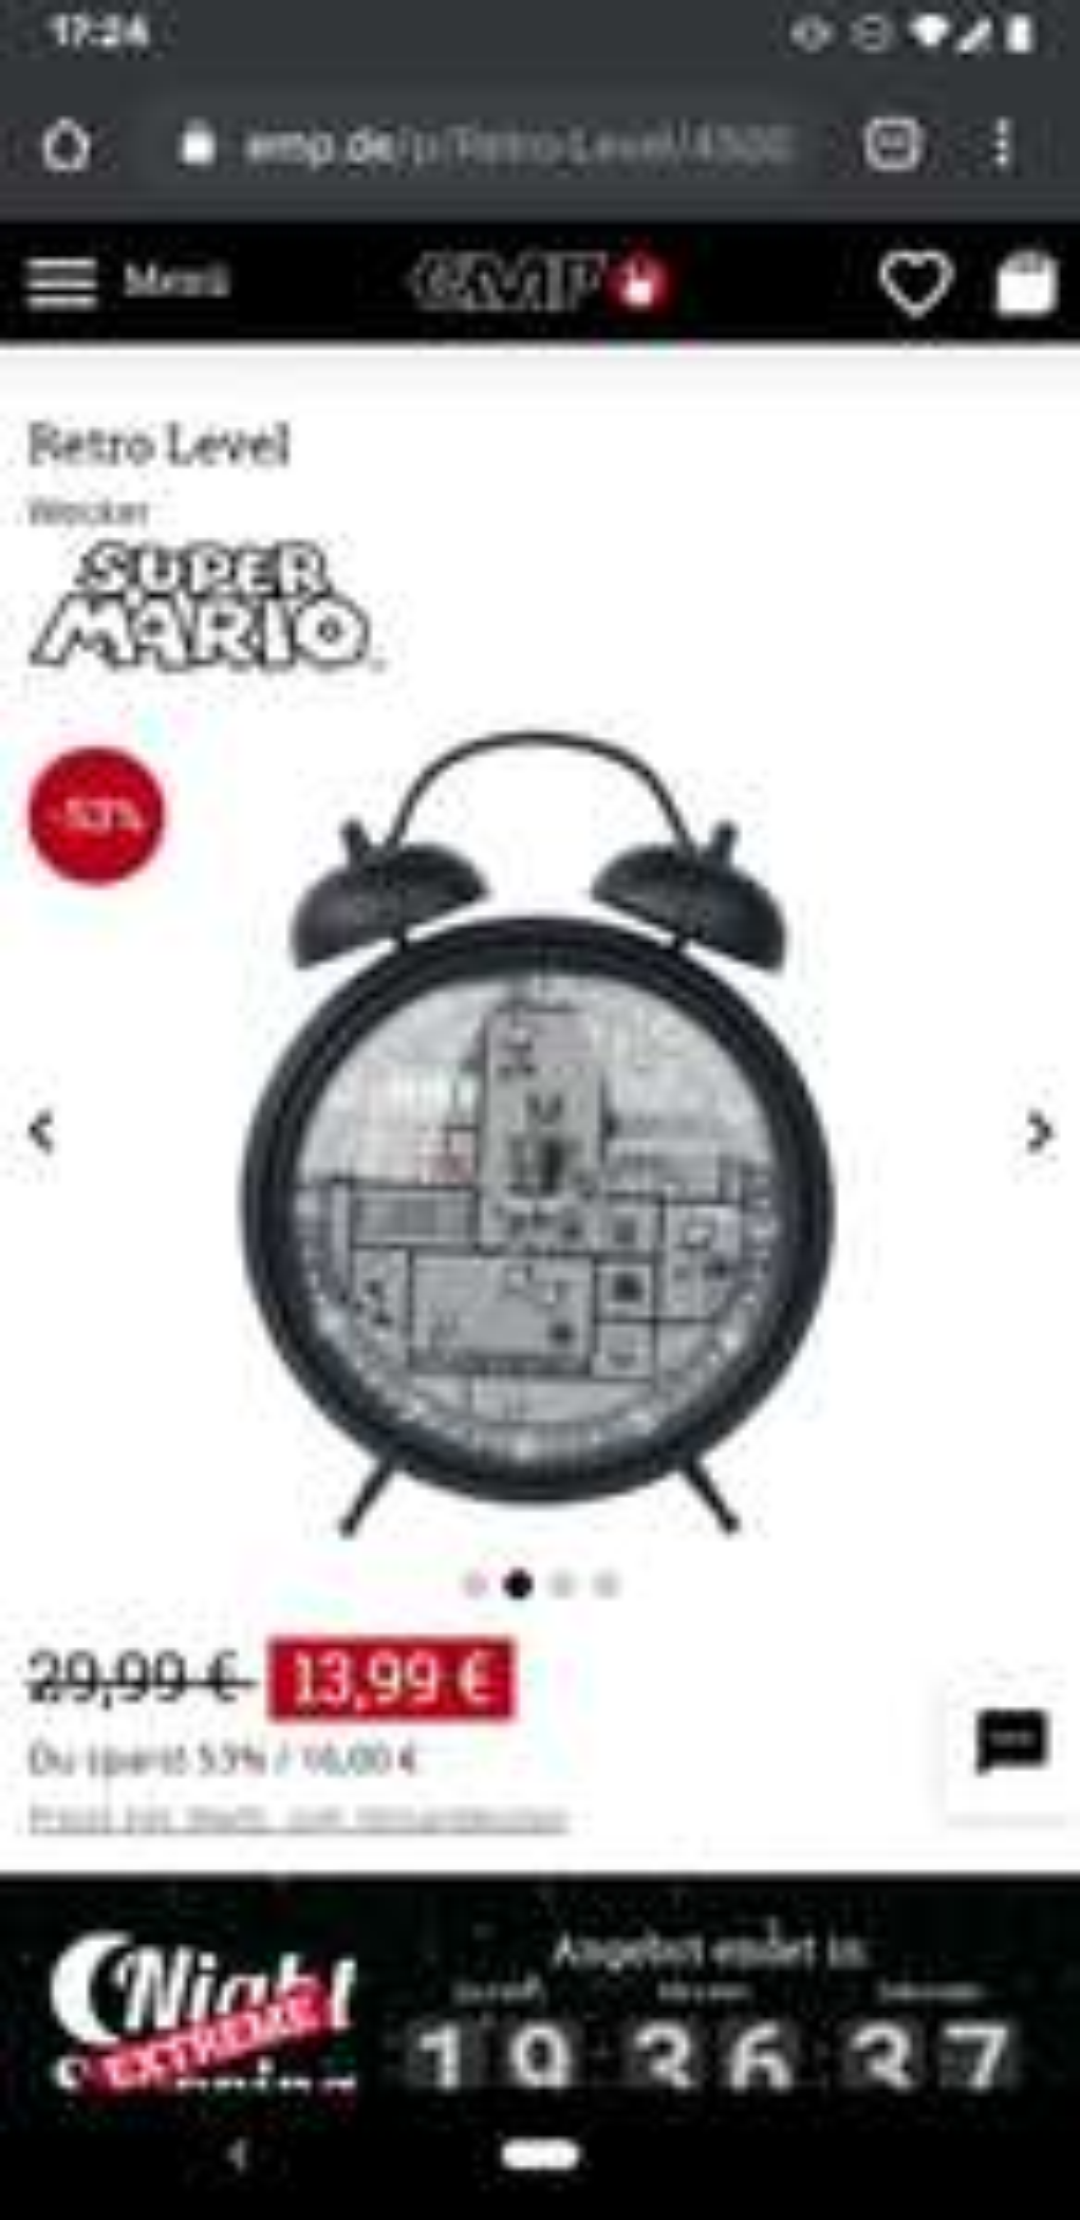 EMP Retro Super Mario Wecker